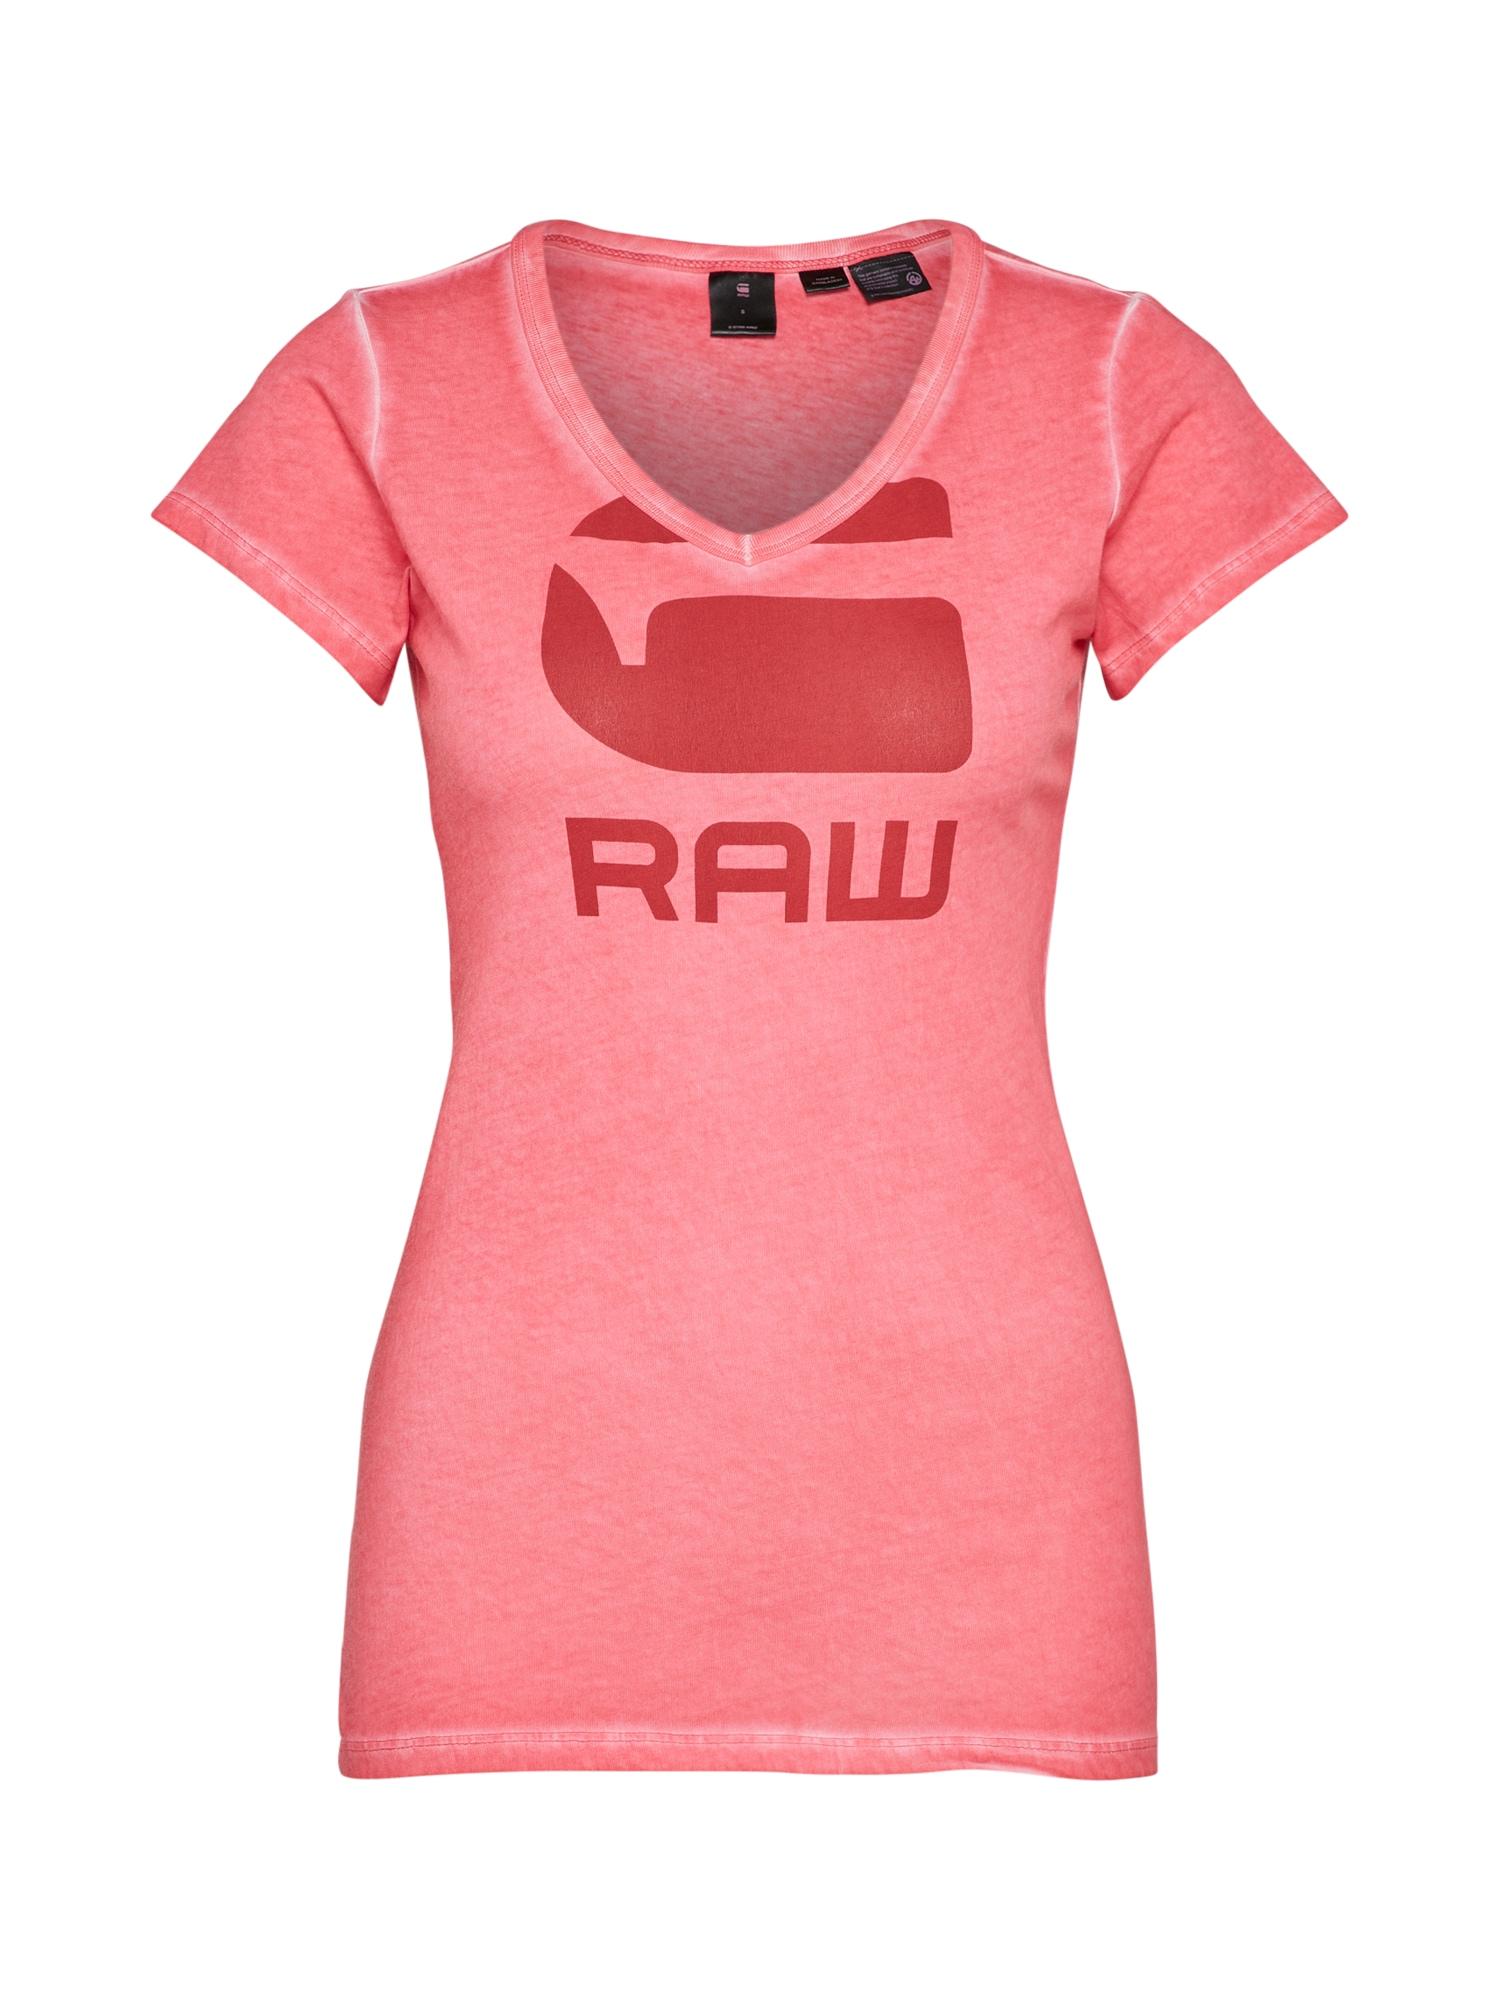 G-STAR RAW Dames Shirt Suphe pink